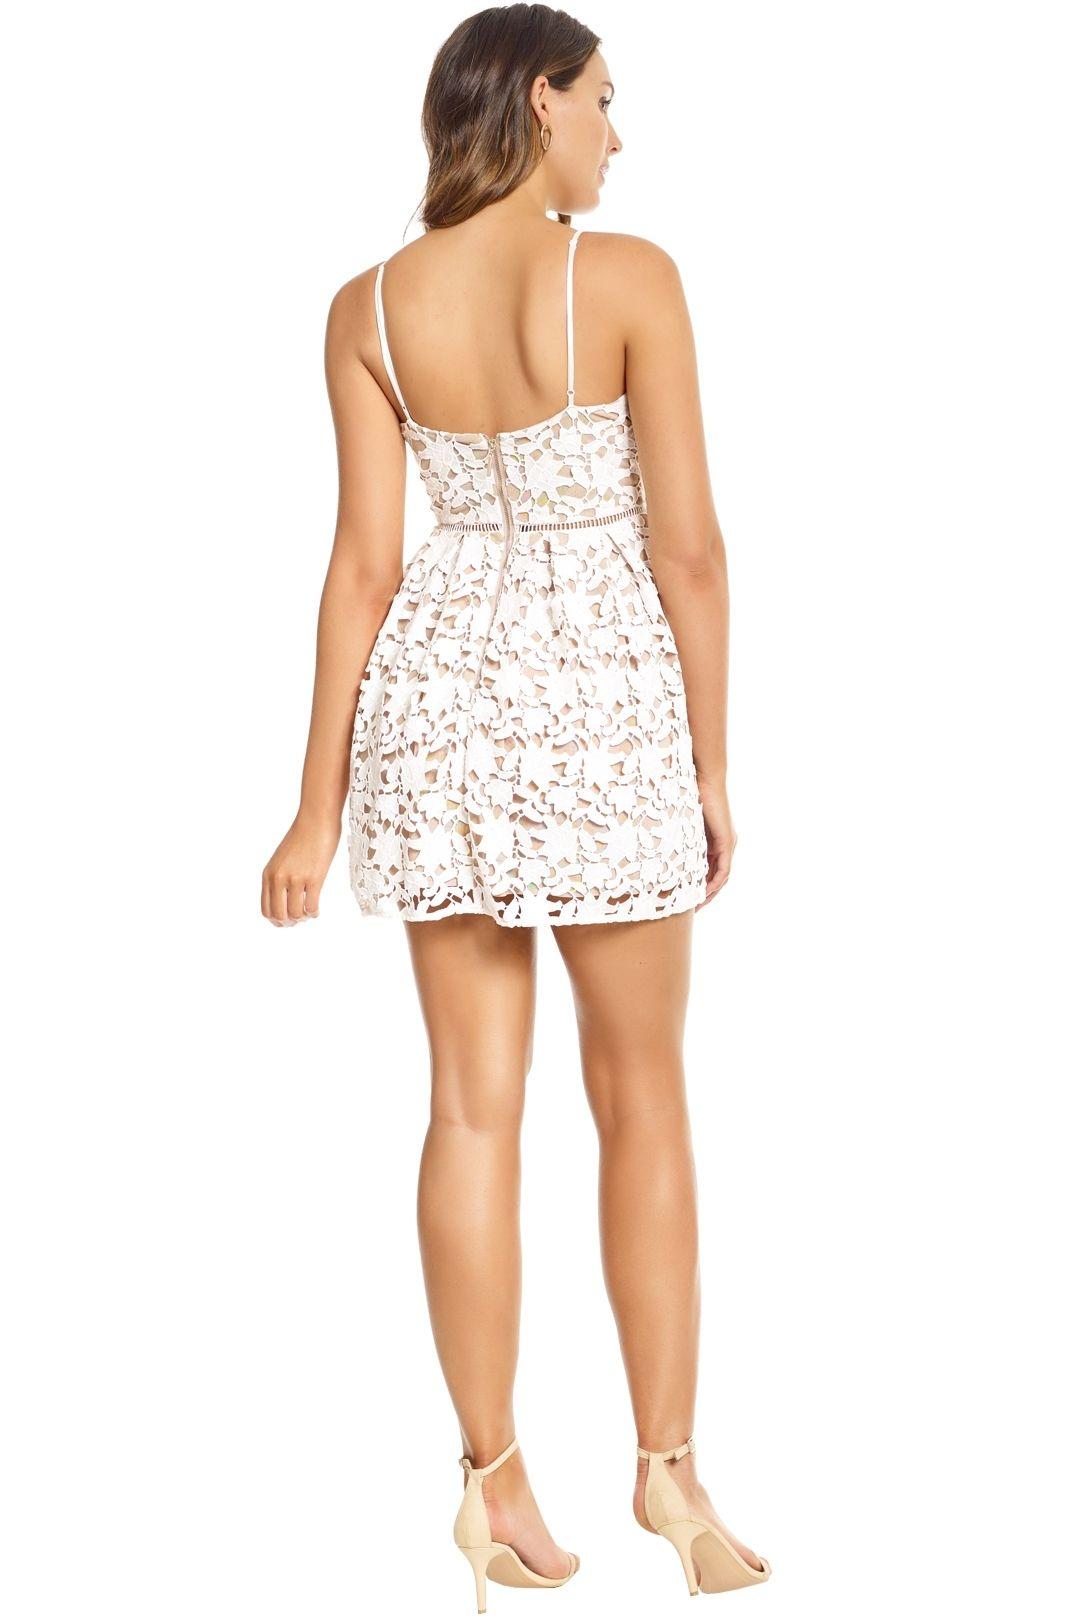 Bronx and Banco - White Florence Mini Dress - White - Back